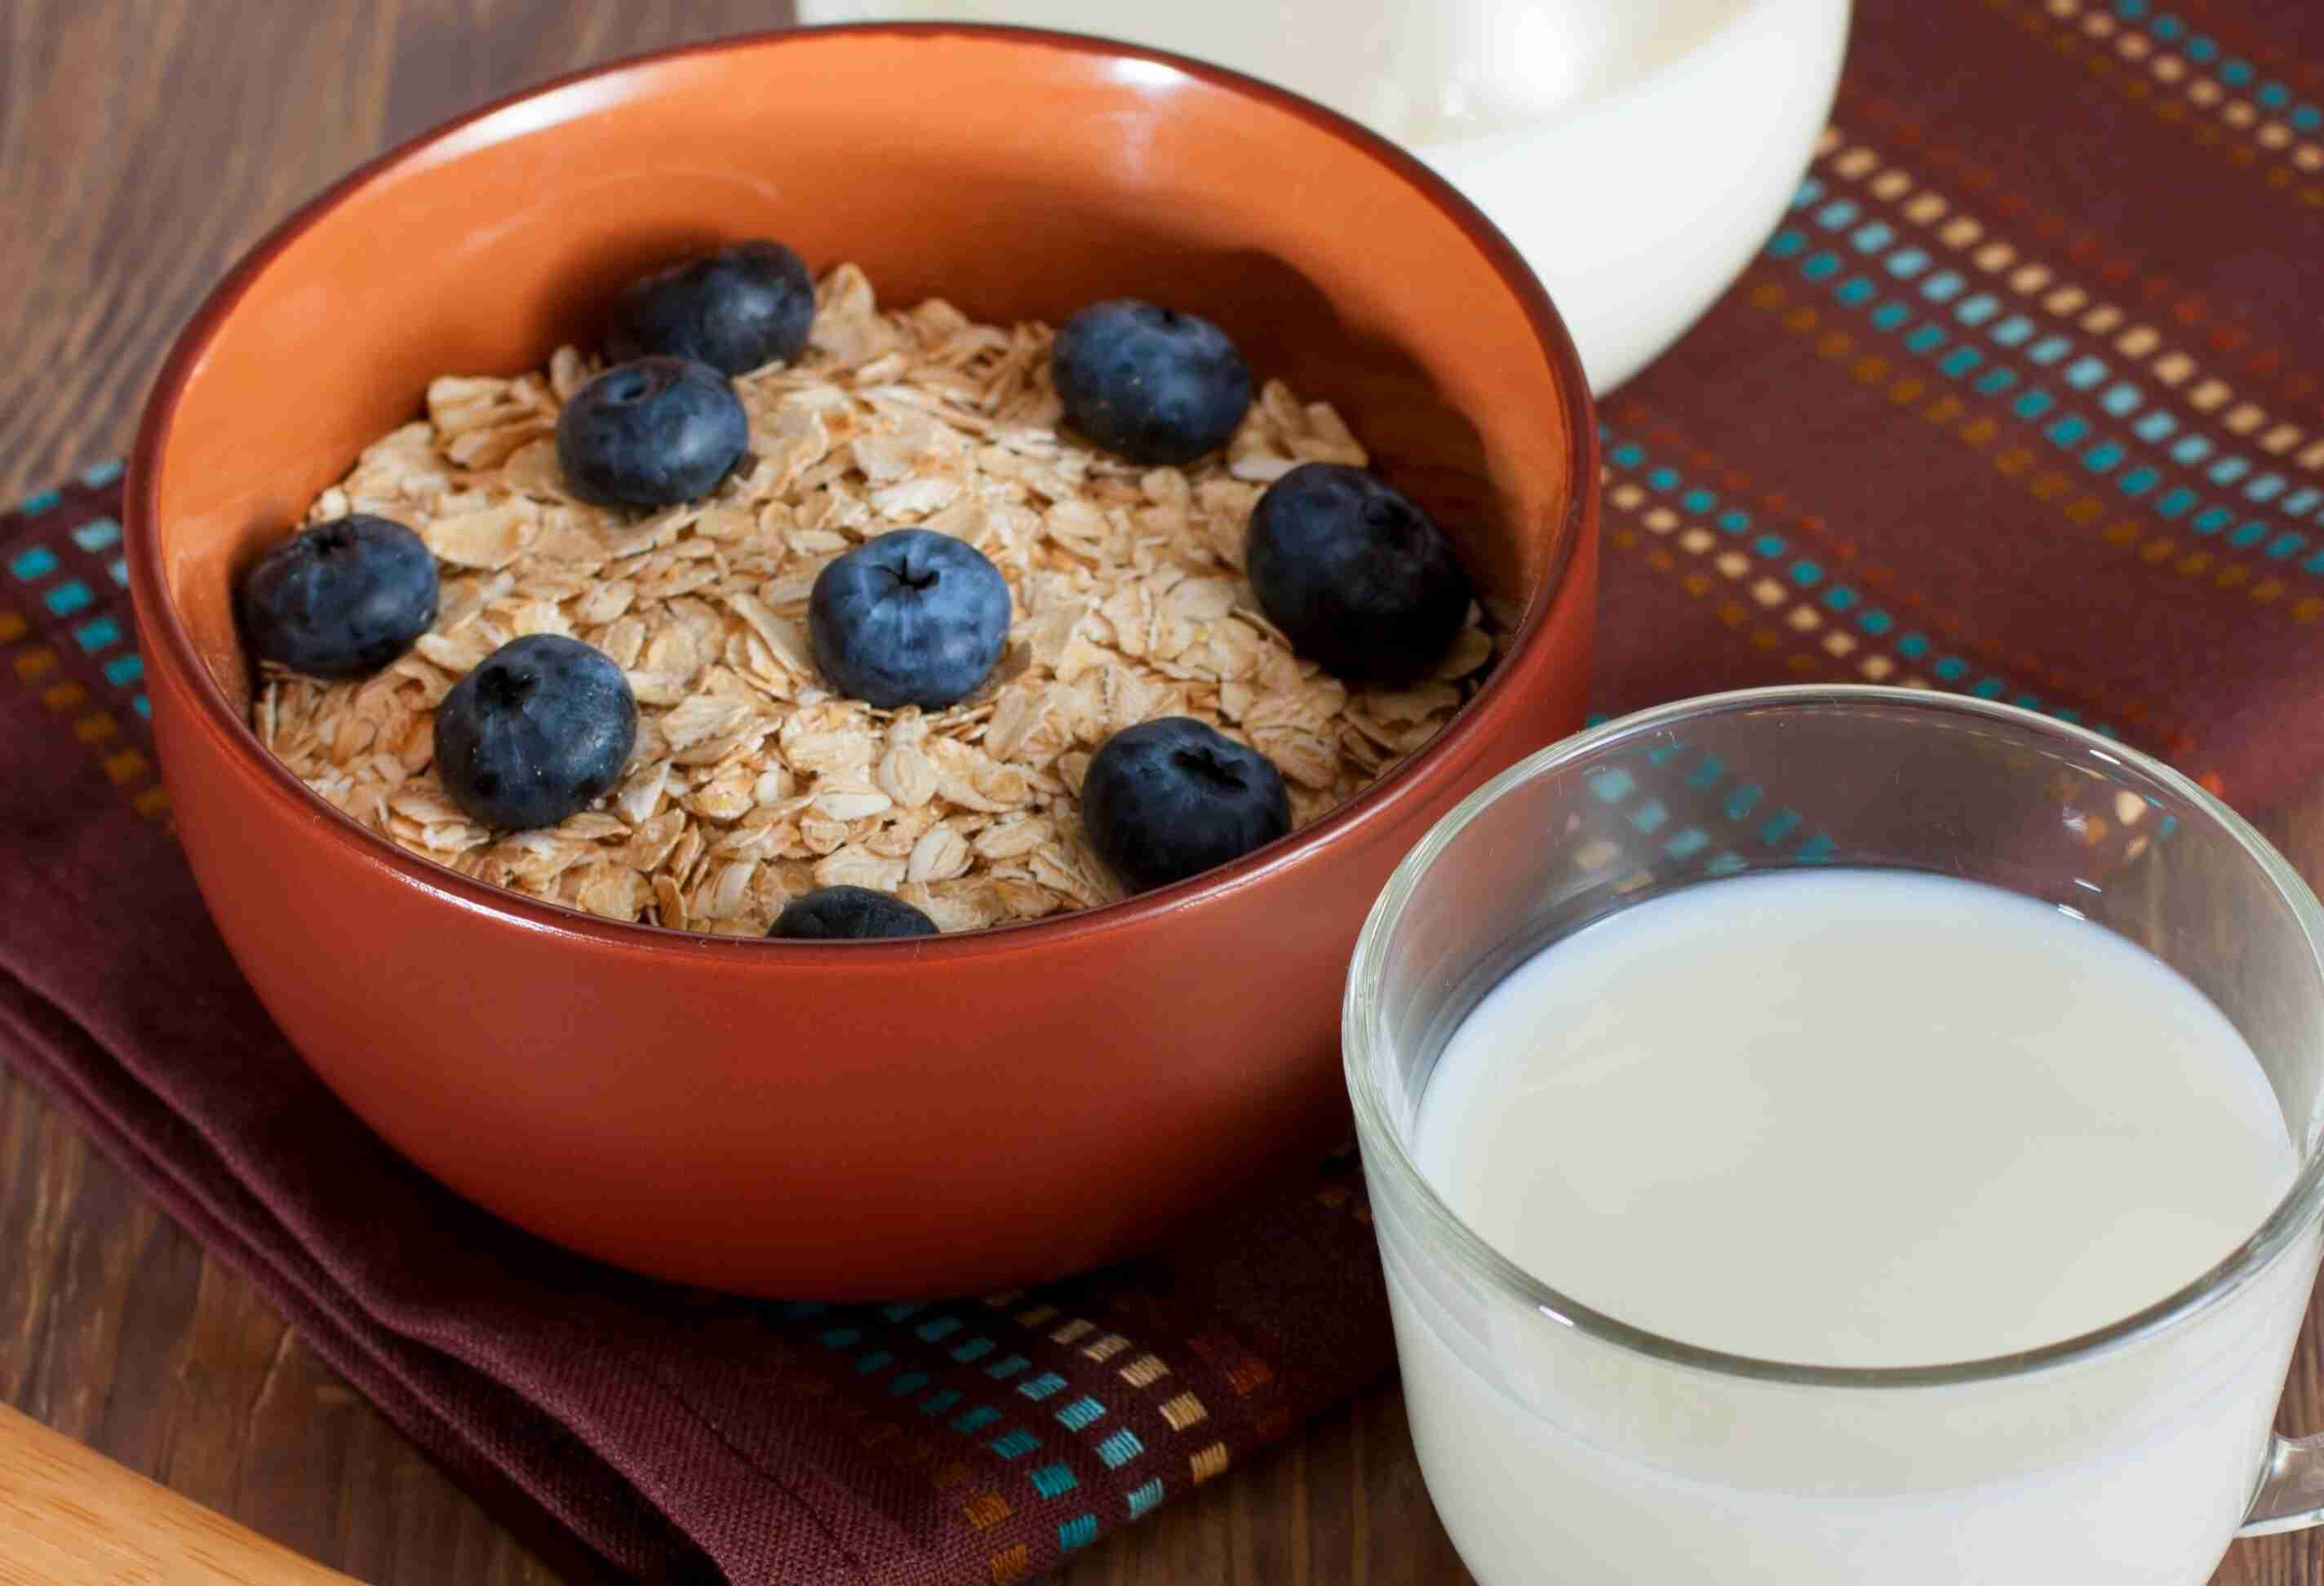 Oatmeal-topped-blueberries-656607-edited.jpg